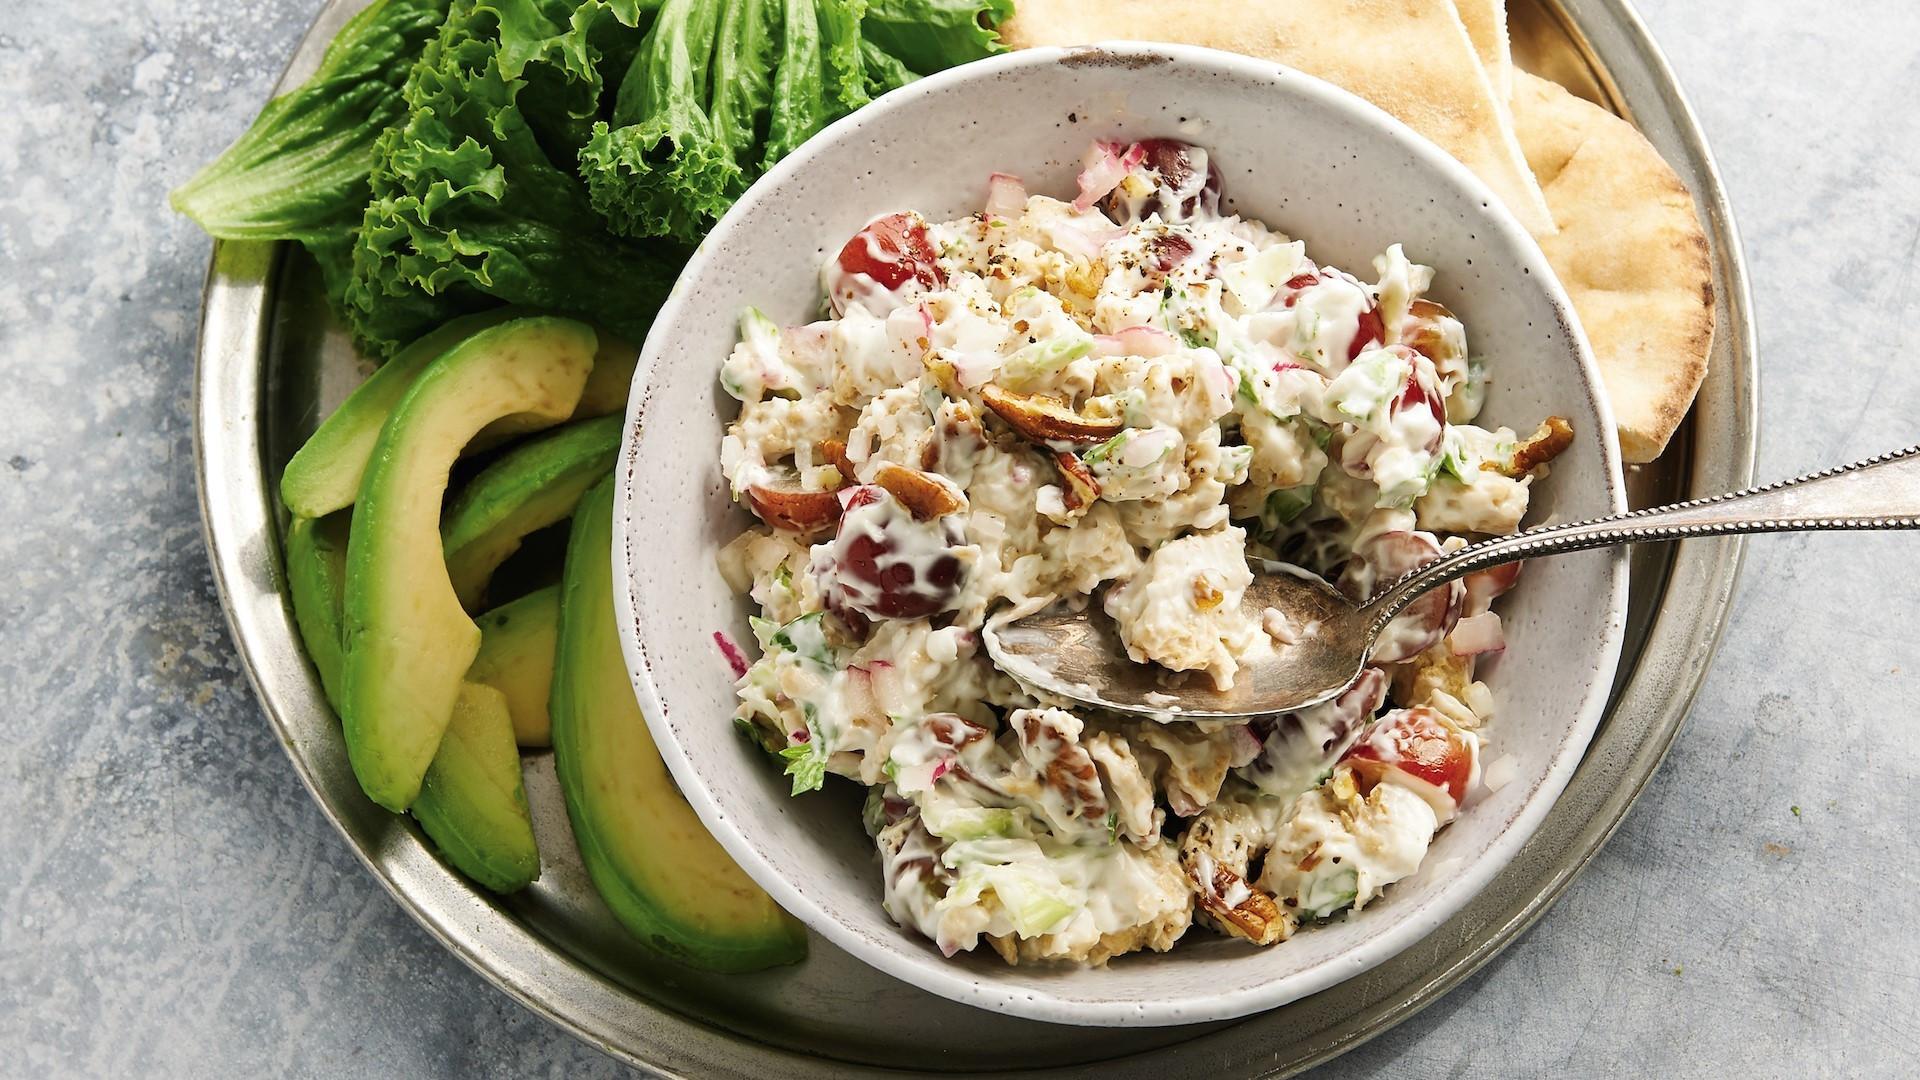 Vegan Chicken Salad  Meatless Monday Waldorf chicken salad is a vegan take